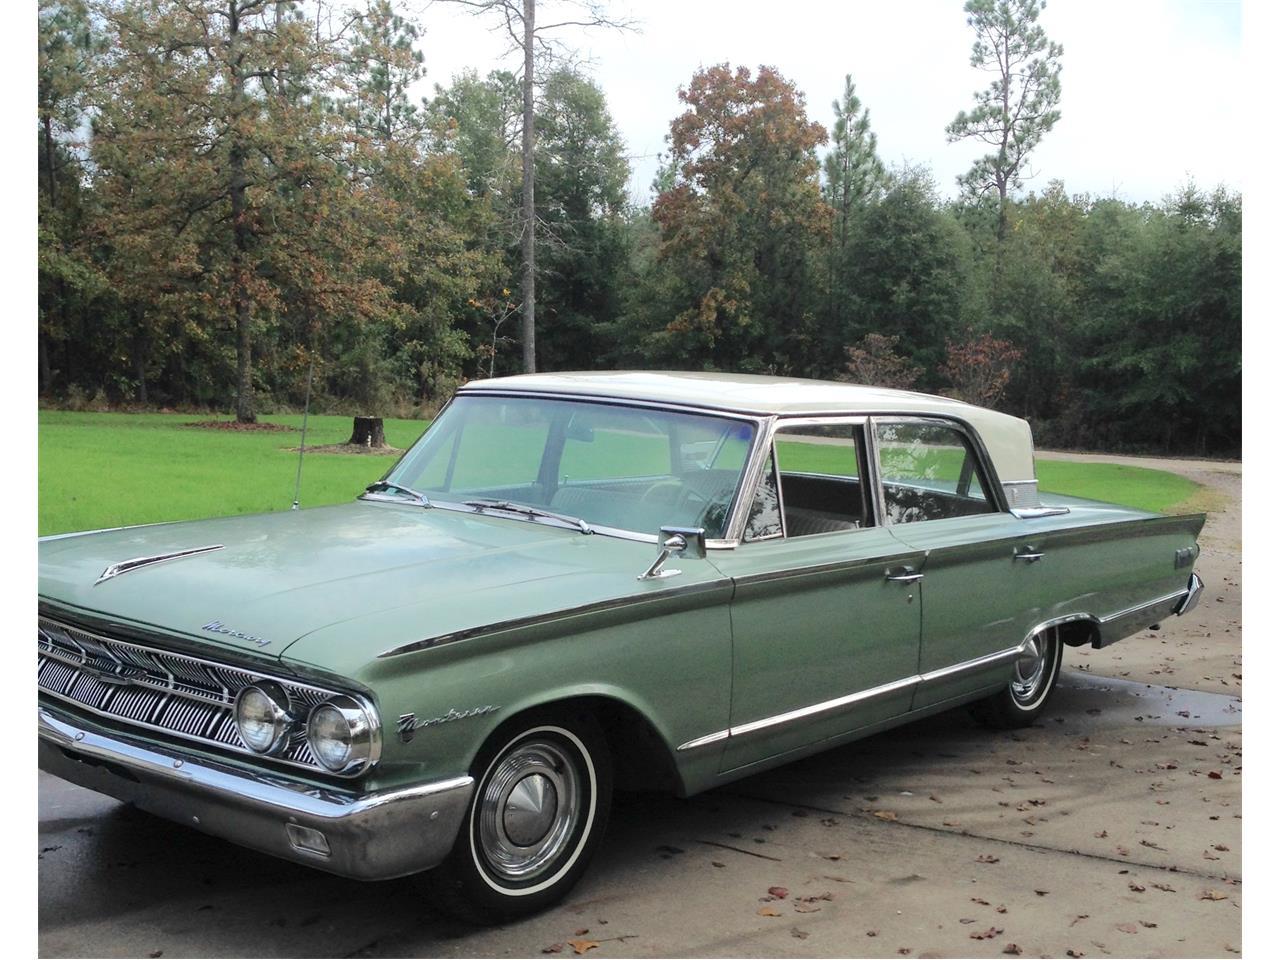 For Sale: 1963 Mercury Monterey in Aiken, South Carolina